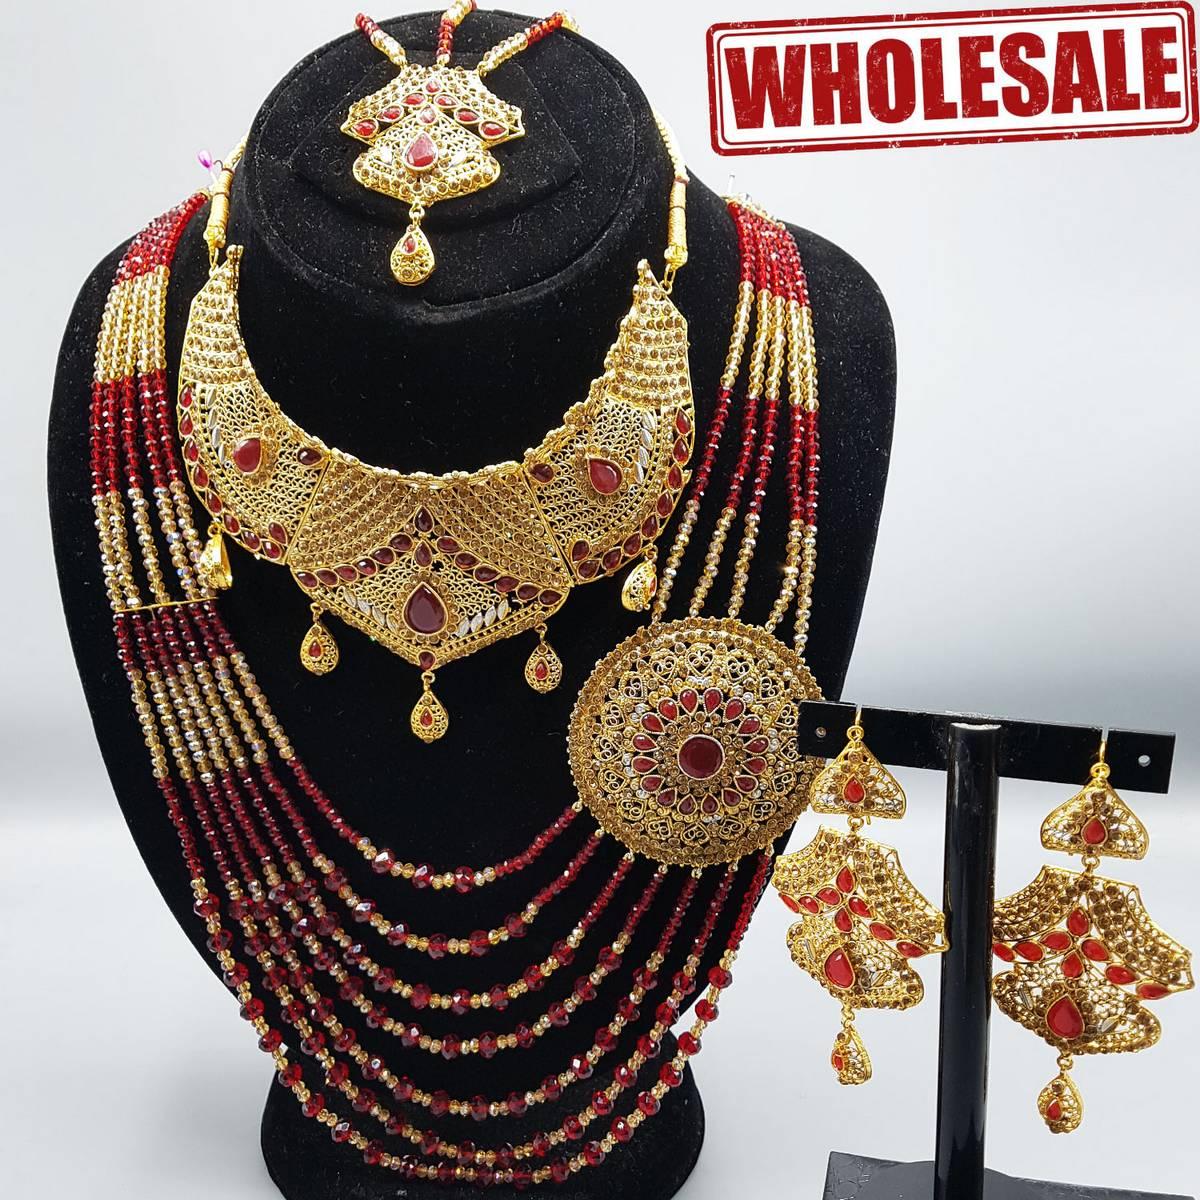 Luxury Jewelry Wedding Bridal Jewelry Set Long Choker Necklace Earrings Maang Tikka Ring